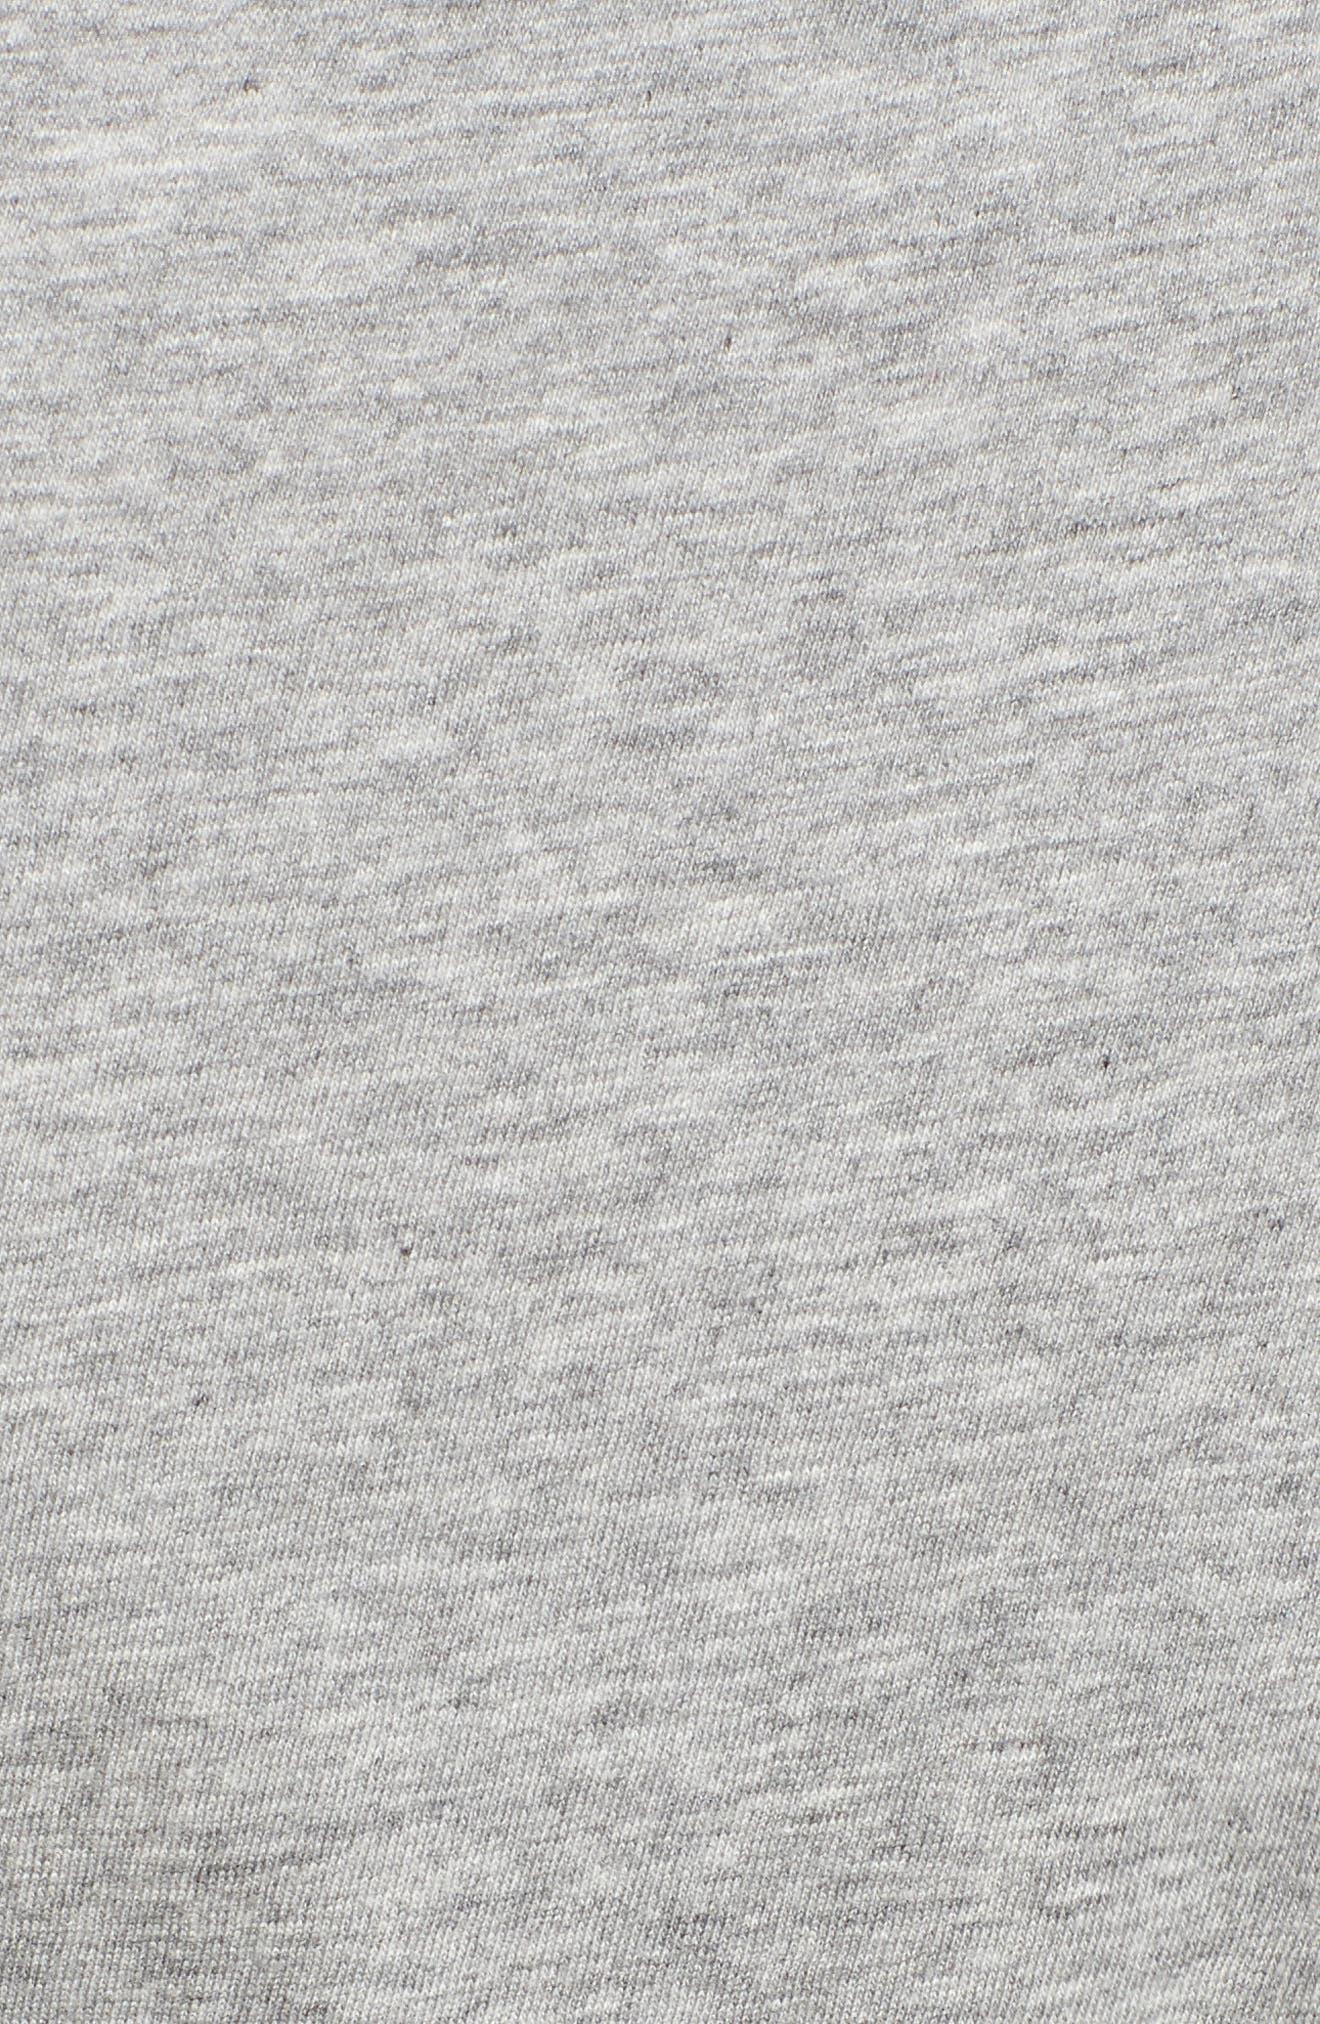 Lola - Mini Stars Tee,                             Alternate thumbnail 5, color,                             Grey